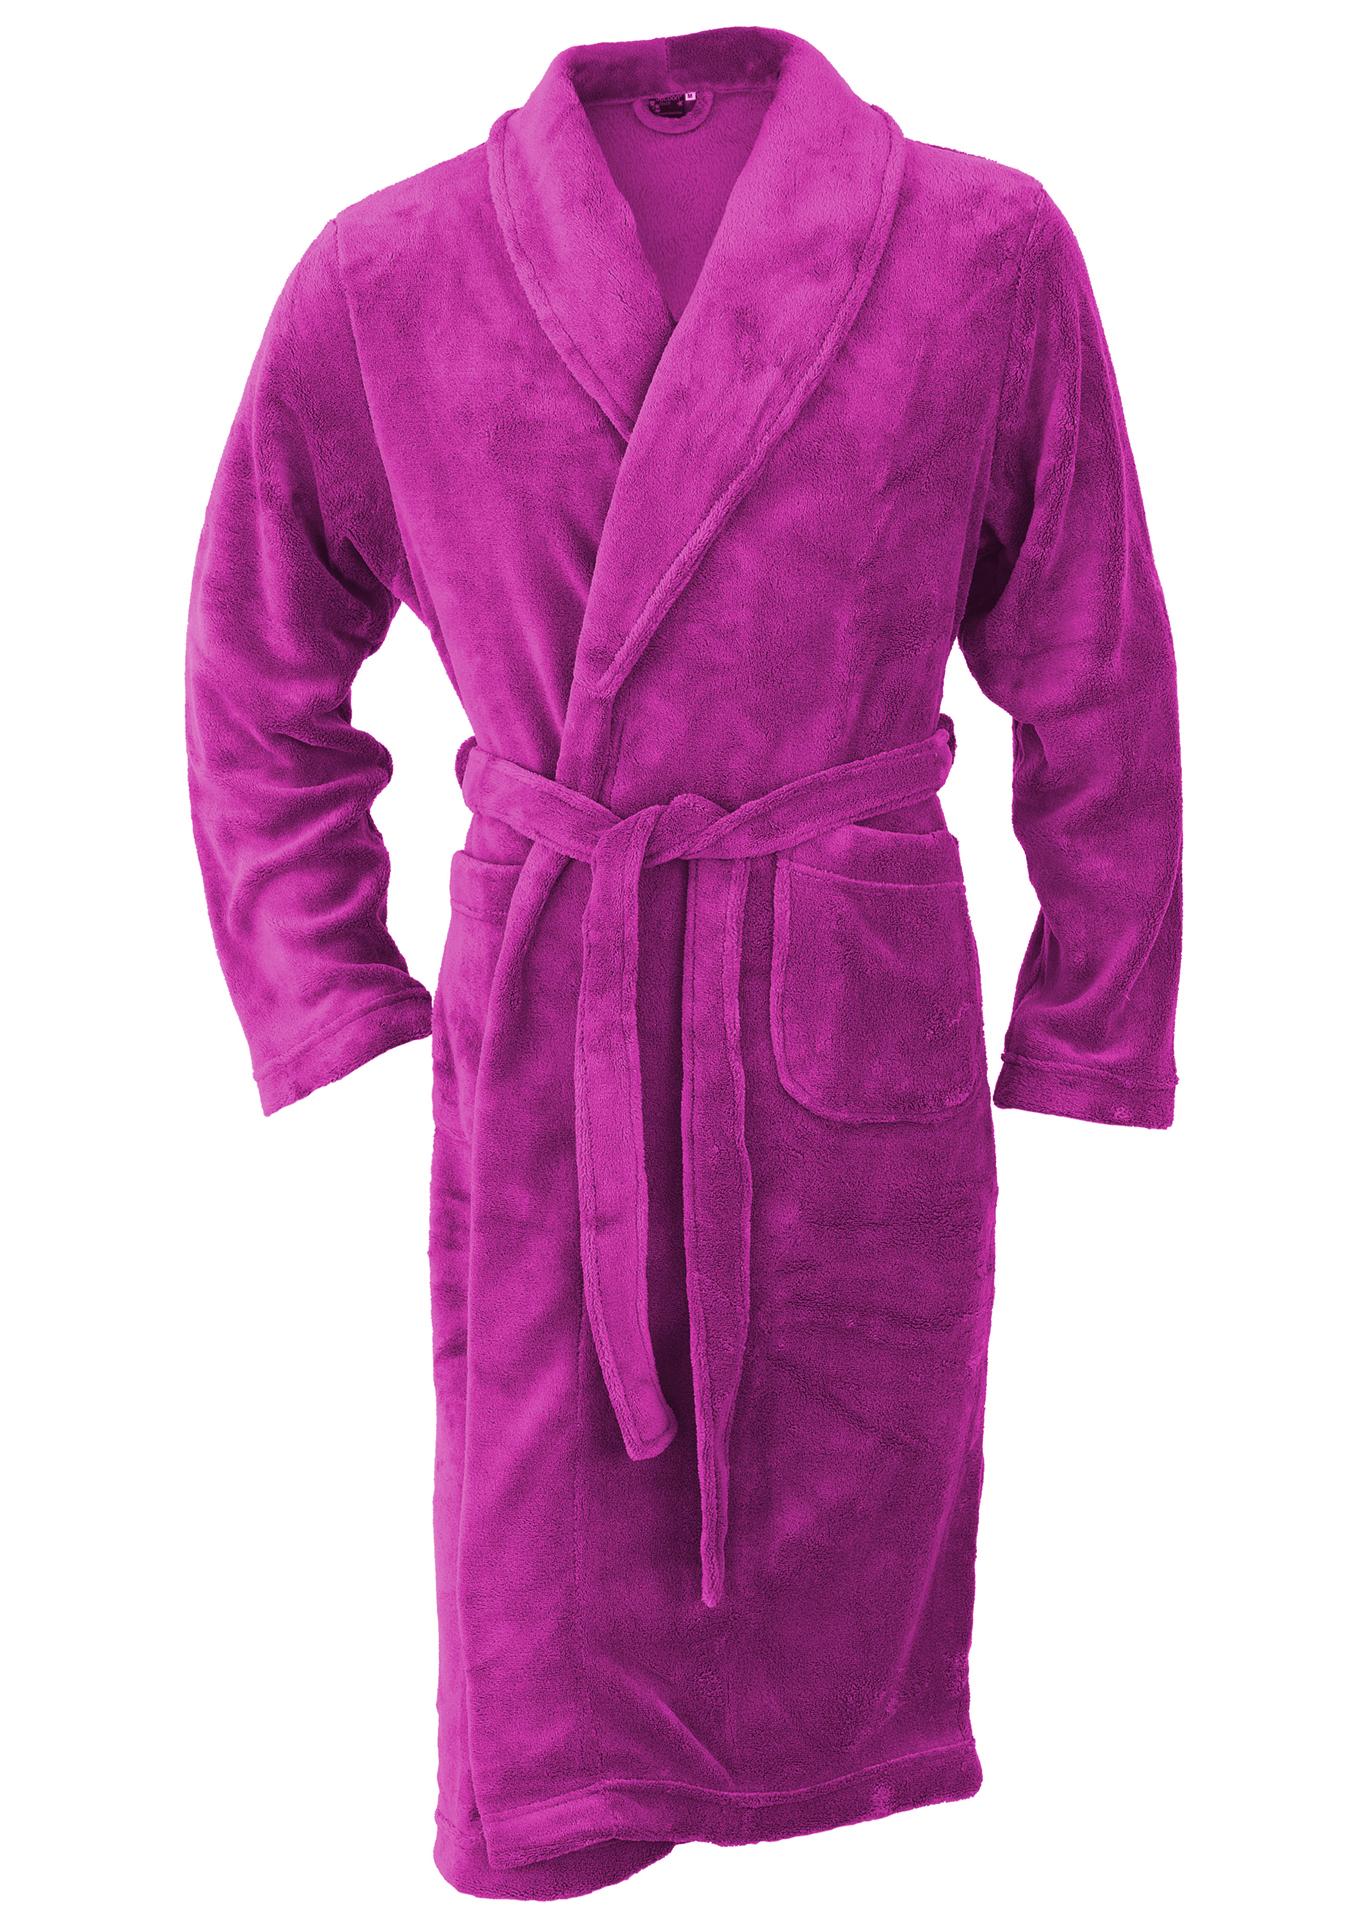 Bademäntel Comfort pink